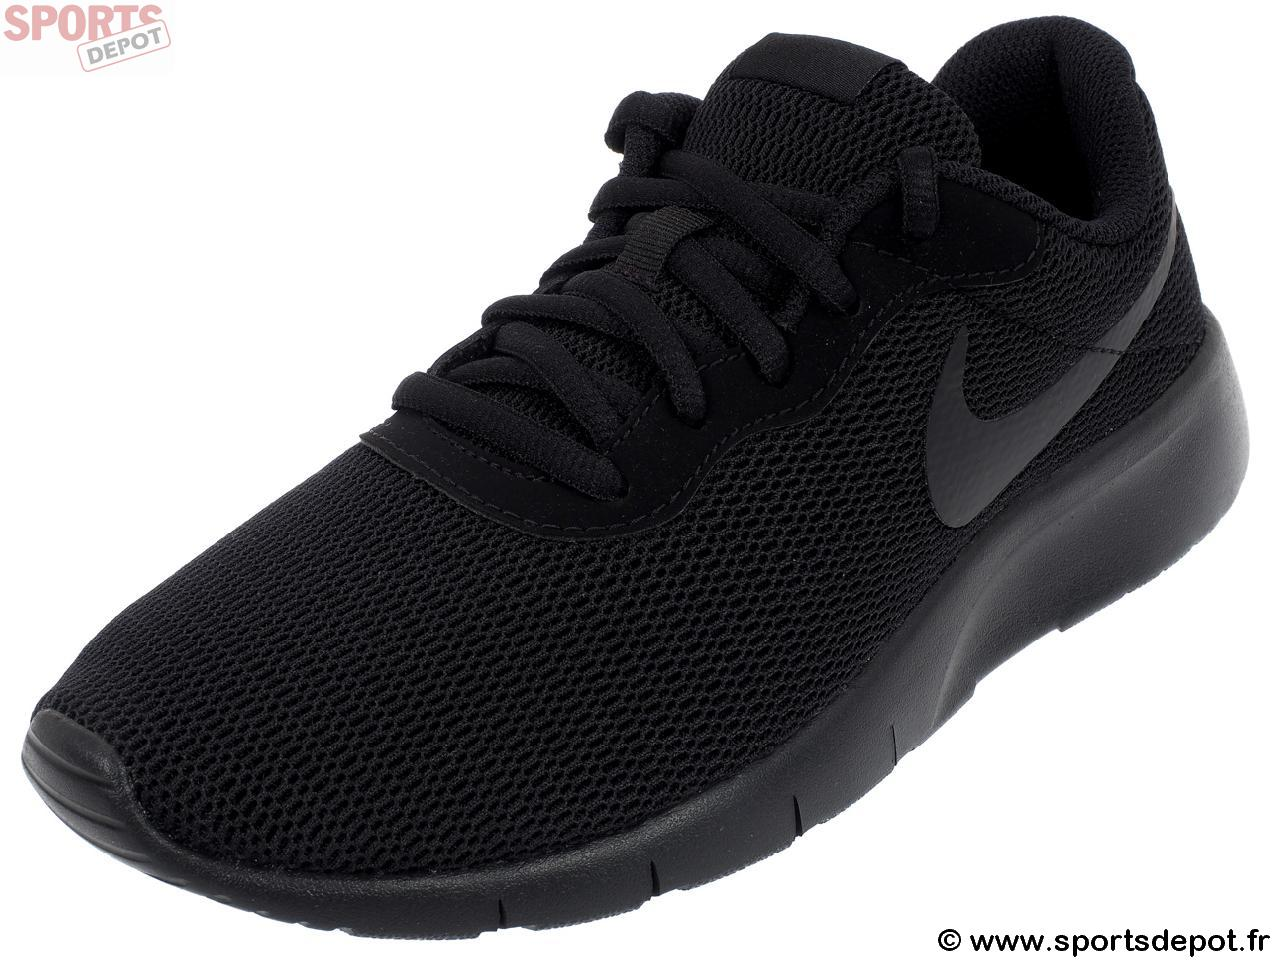 721d61acd804 Acheter Chaussures running mode NIKE Tanjun jr noir noir - Enfant ...